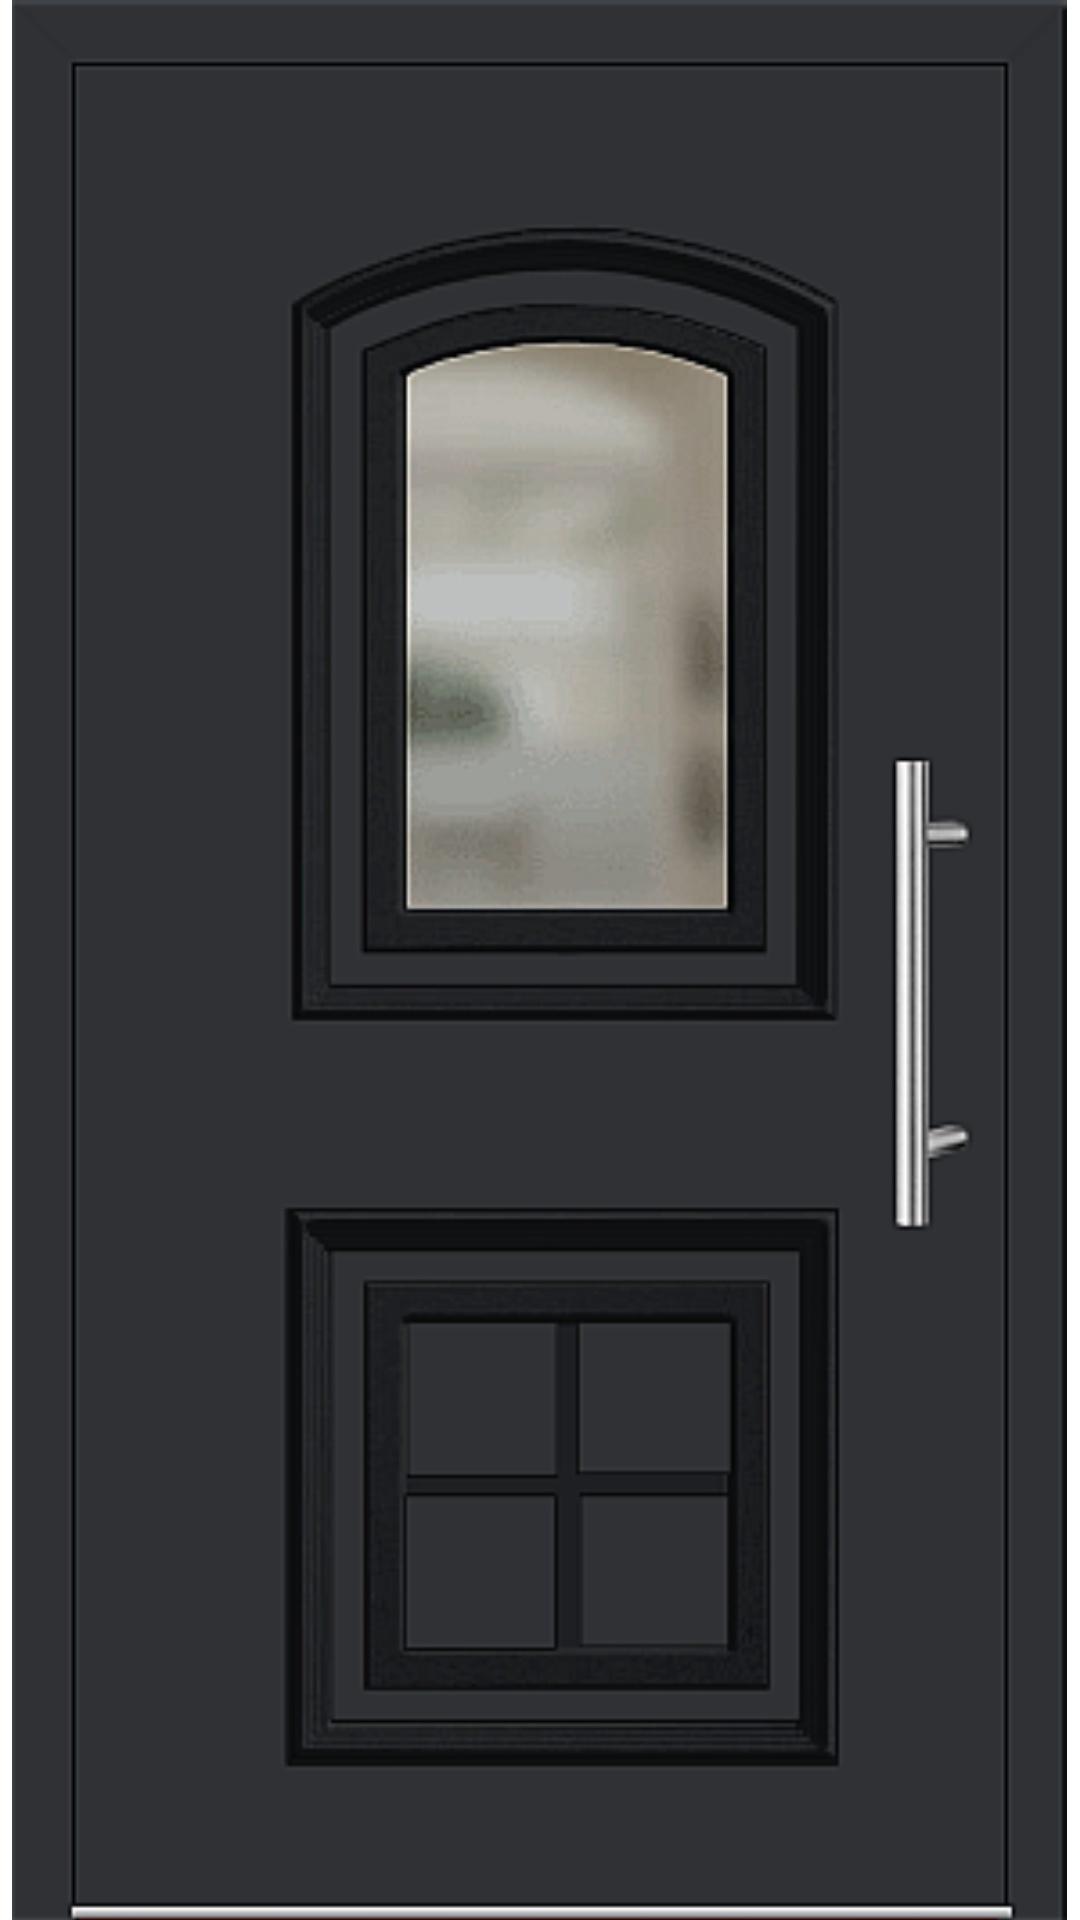 Aluminium Haustür Modell 6455-15 schwarz